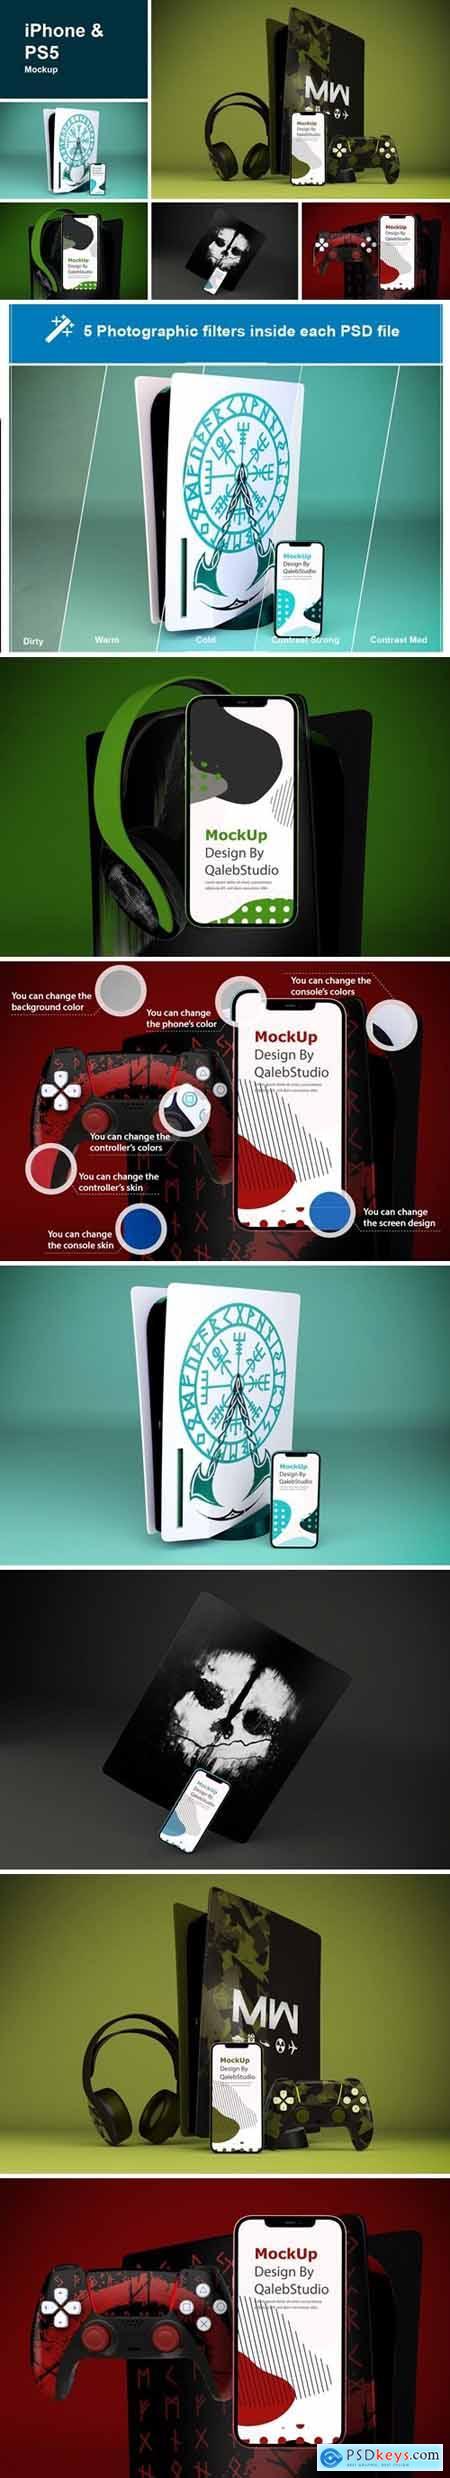 iPhone 12 & PS5 Mockup